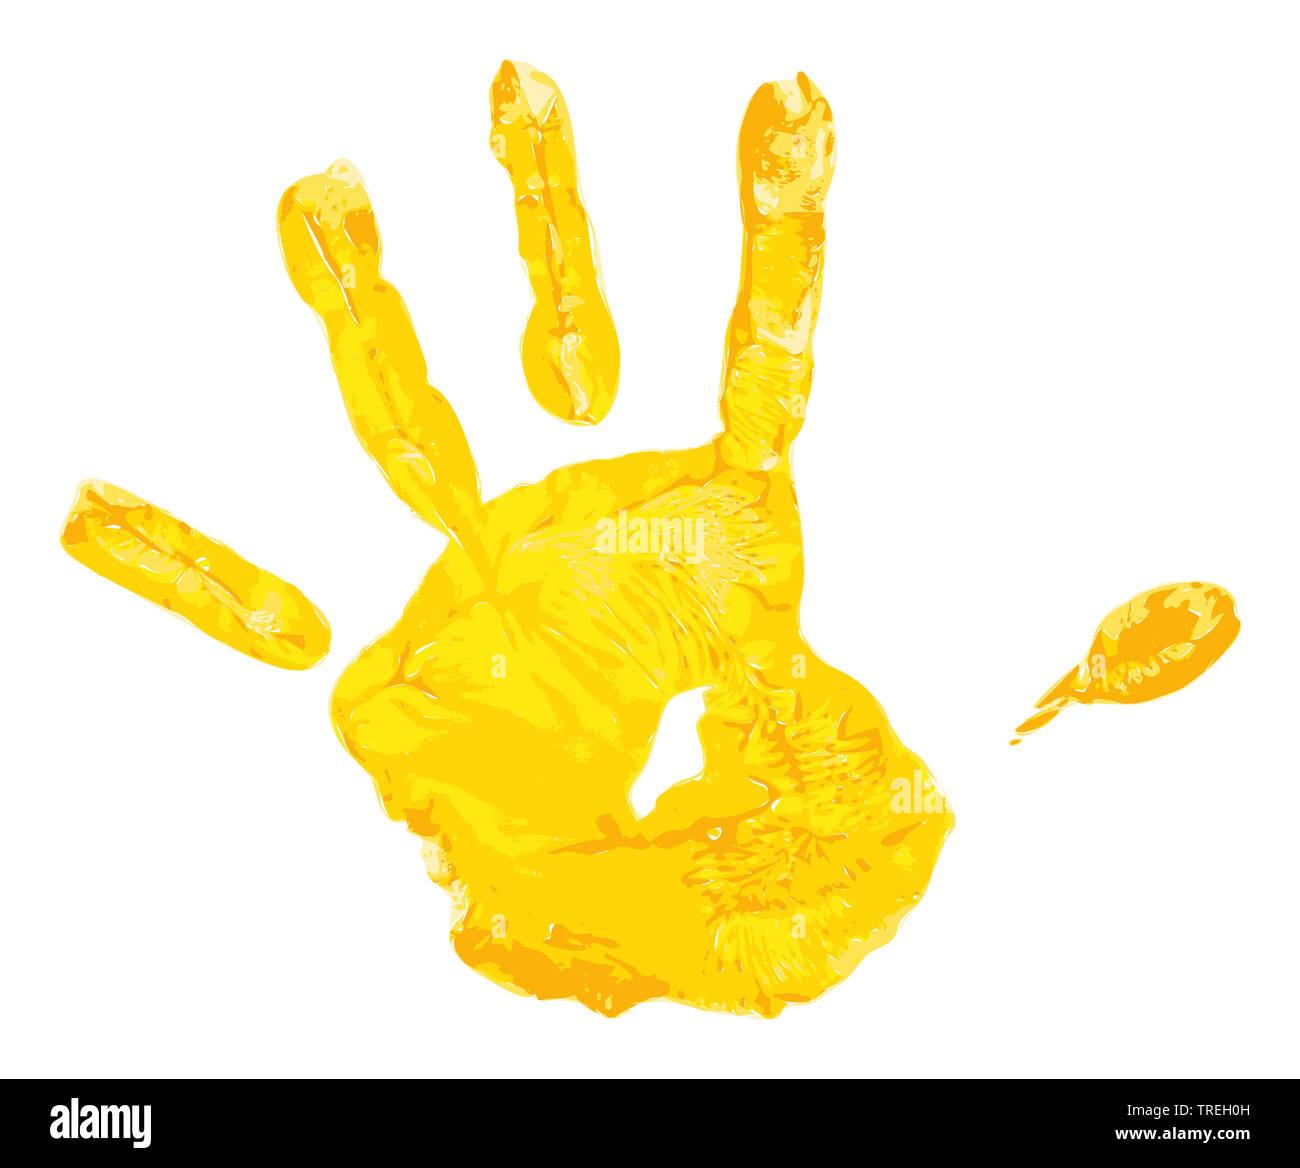 Mit gelber Wasserfarbe erzeugter Kinderhandabdruck vor weissem Hintergrund | Handprint of a child made out of yellow water colors against white backgr - Stock Image